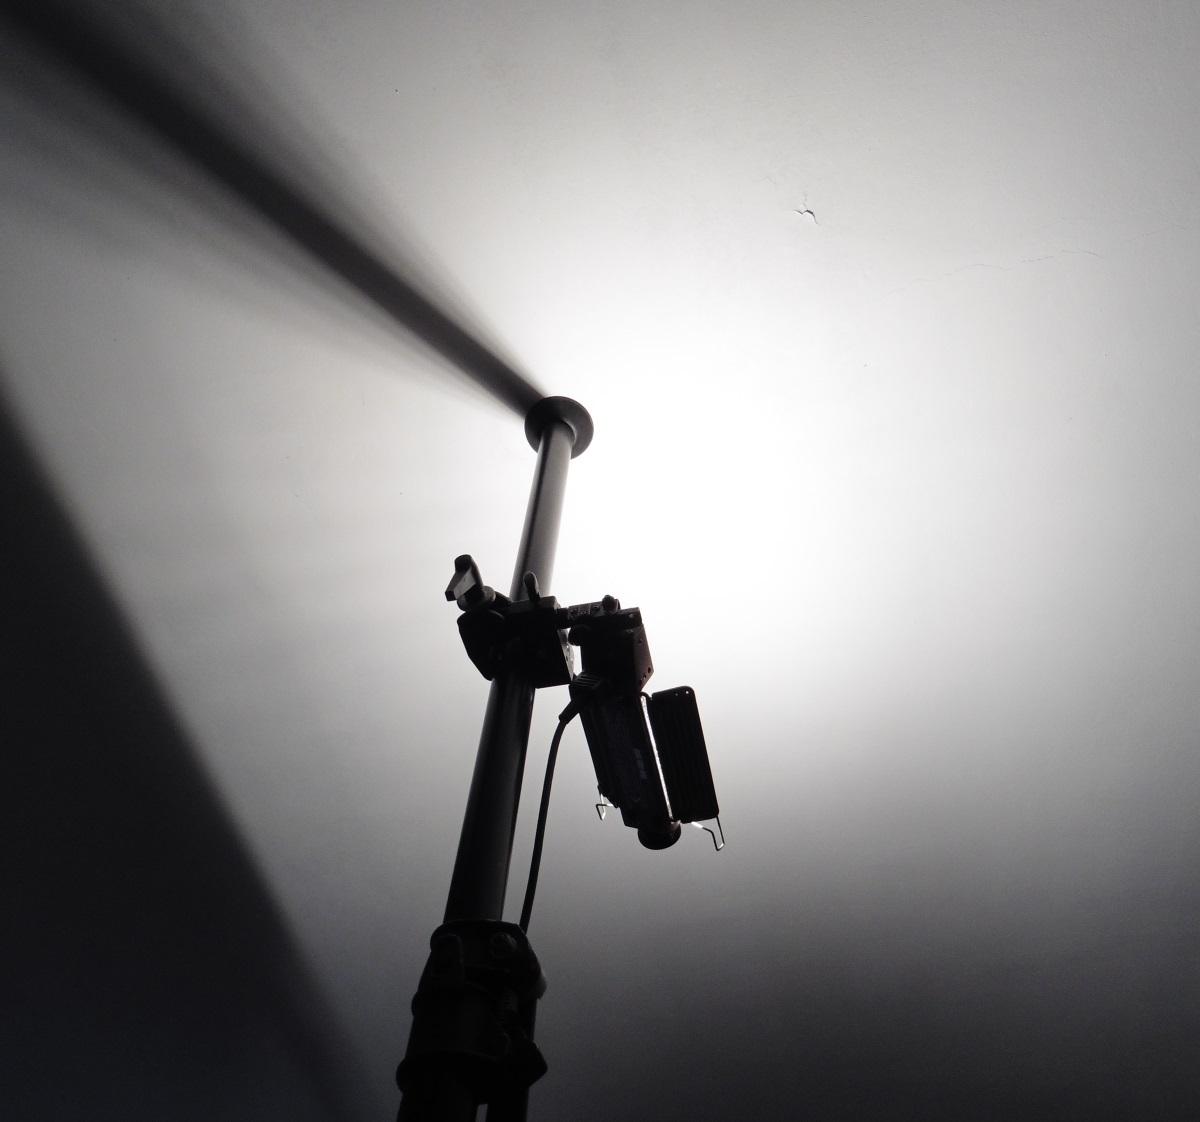 Effet de la lampe halogène Tota-light de Lowel - Image : Sophie Caclin